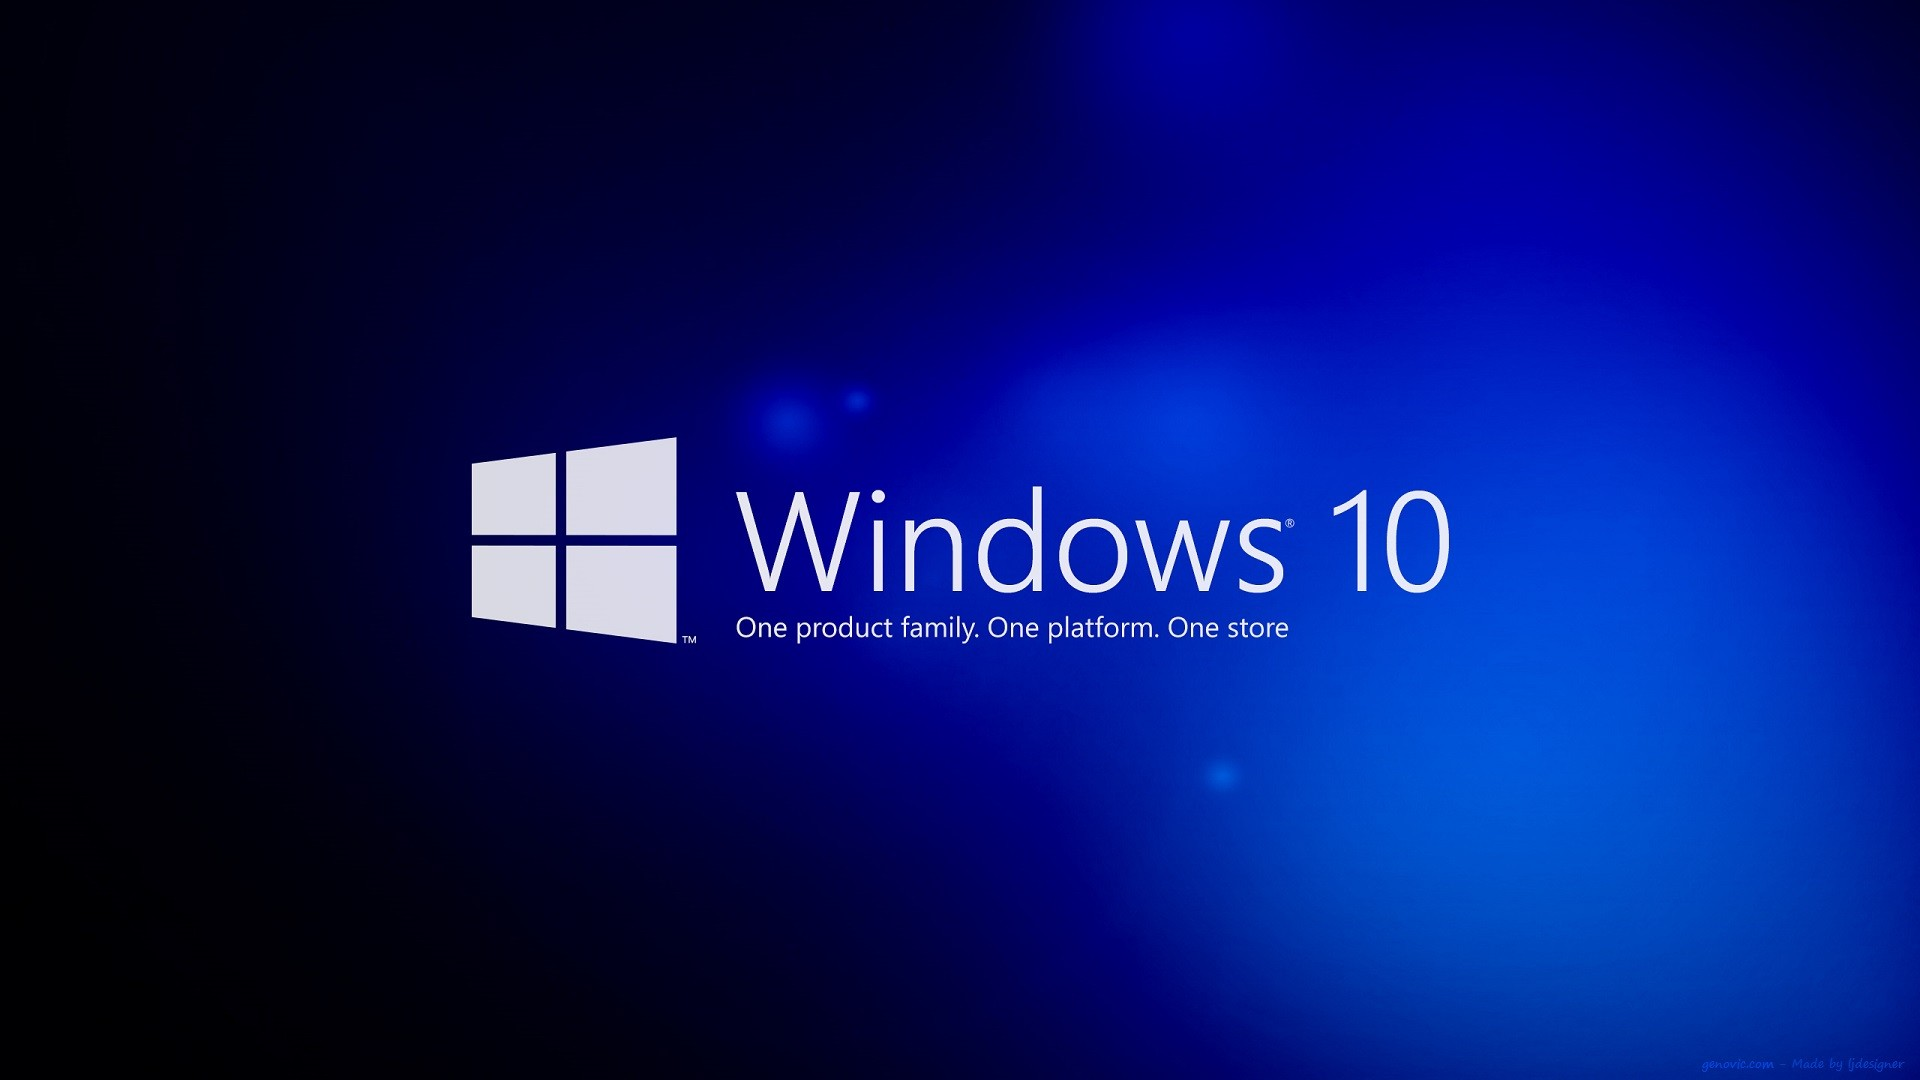 Windows 10 Wallpaper Hd 1080p Download Free Beautiful Wallpapers